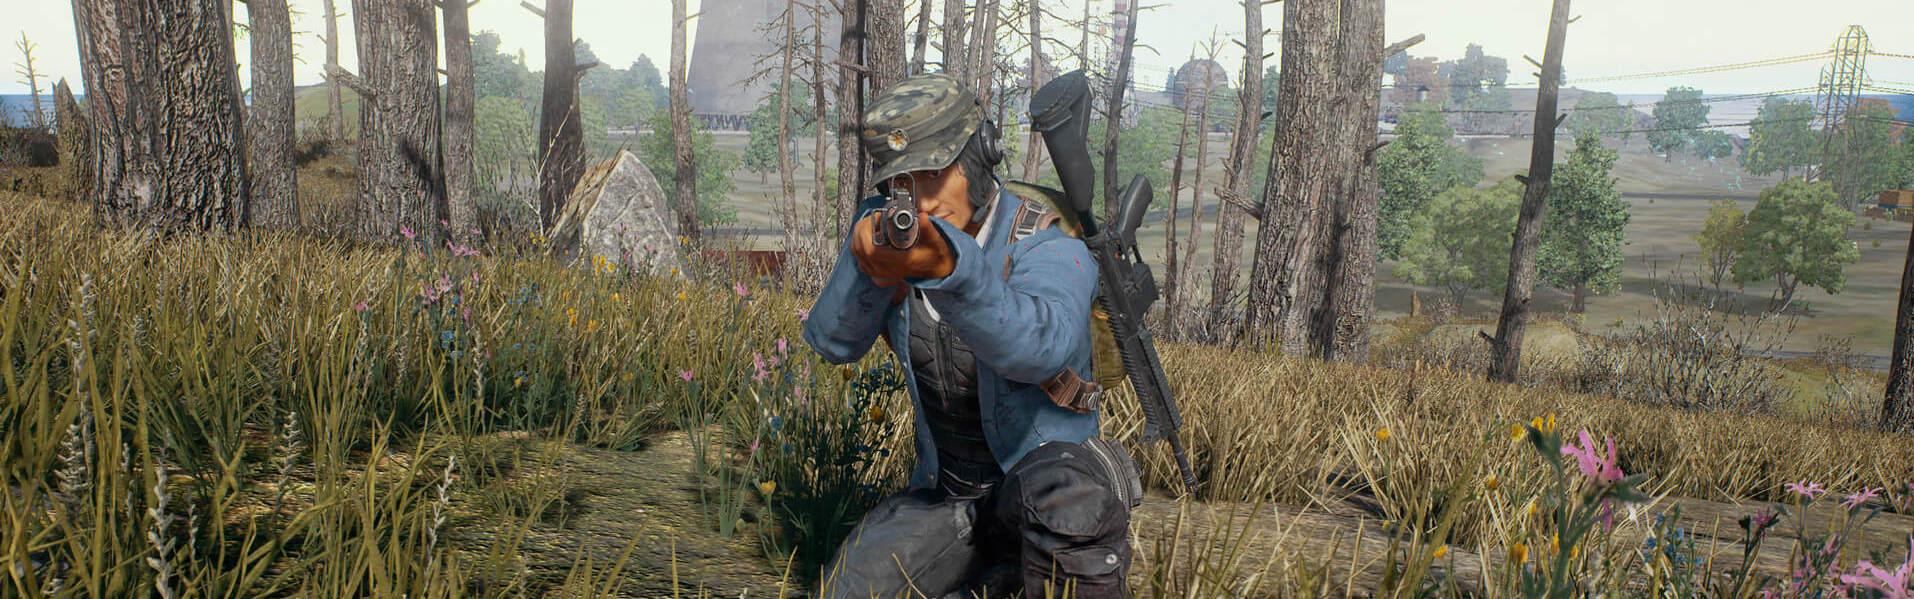 PlayerUnknown's Battlegrounds - Survivor Pass 3: Wild Card (DLC) Steam Key GLOBAL